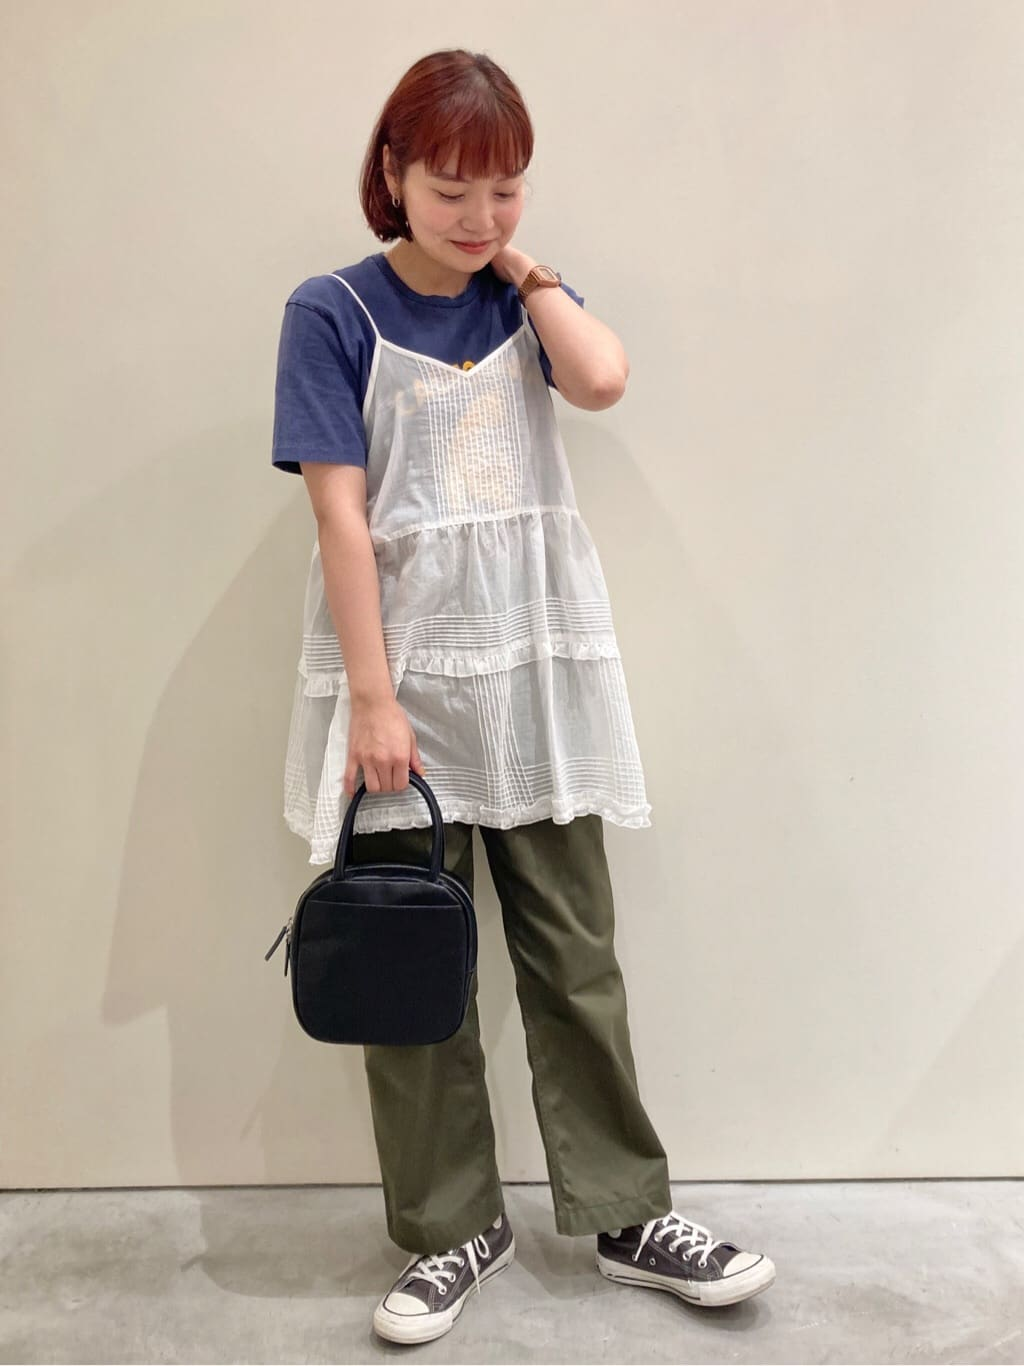 Dot and Stripes CHILD WOMAN CHILD WOMAN , PAR ICI 新宿ミロード 身長:160cm 2021.08.13